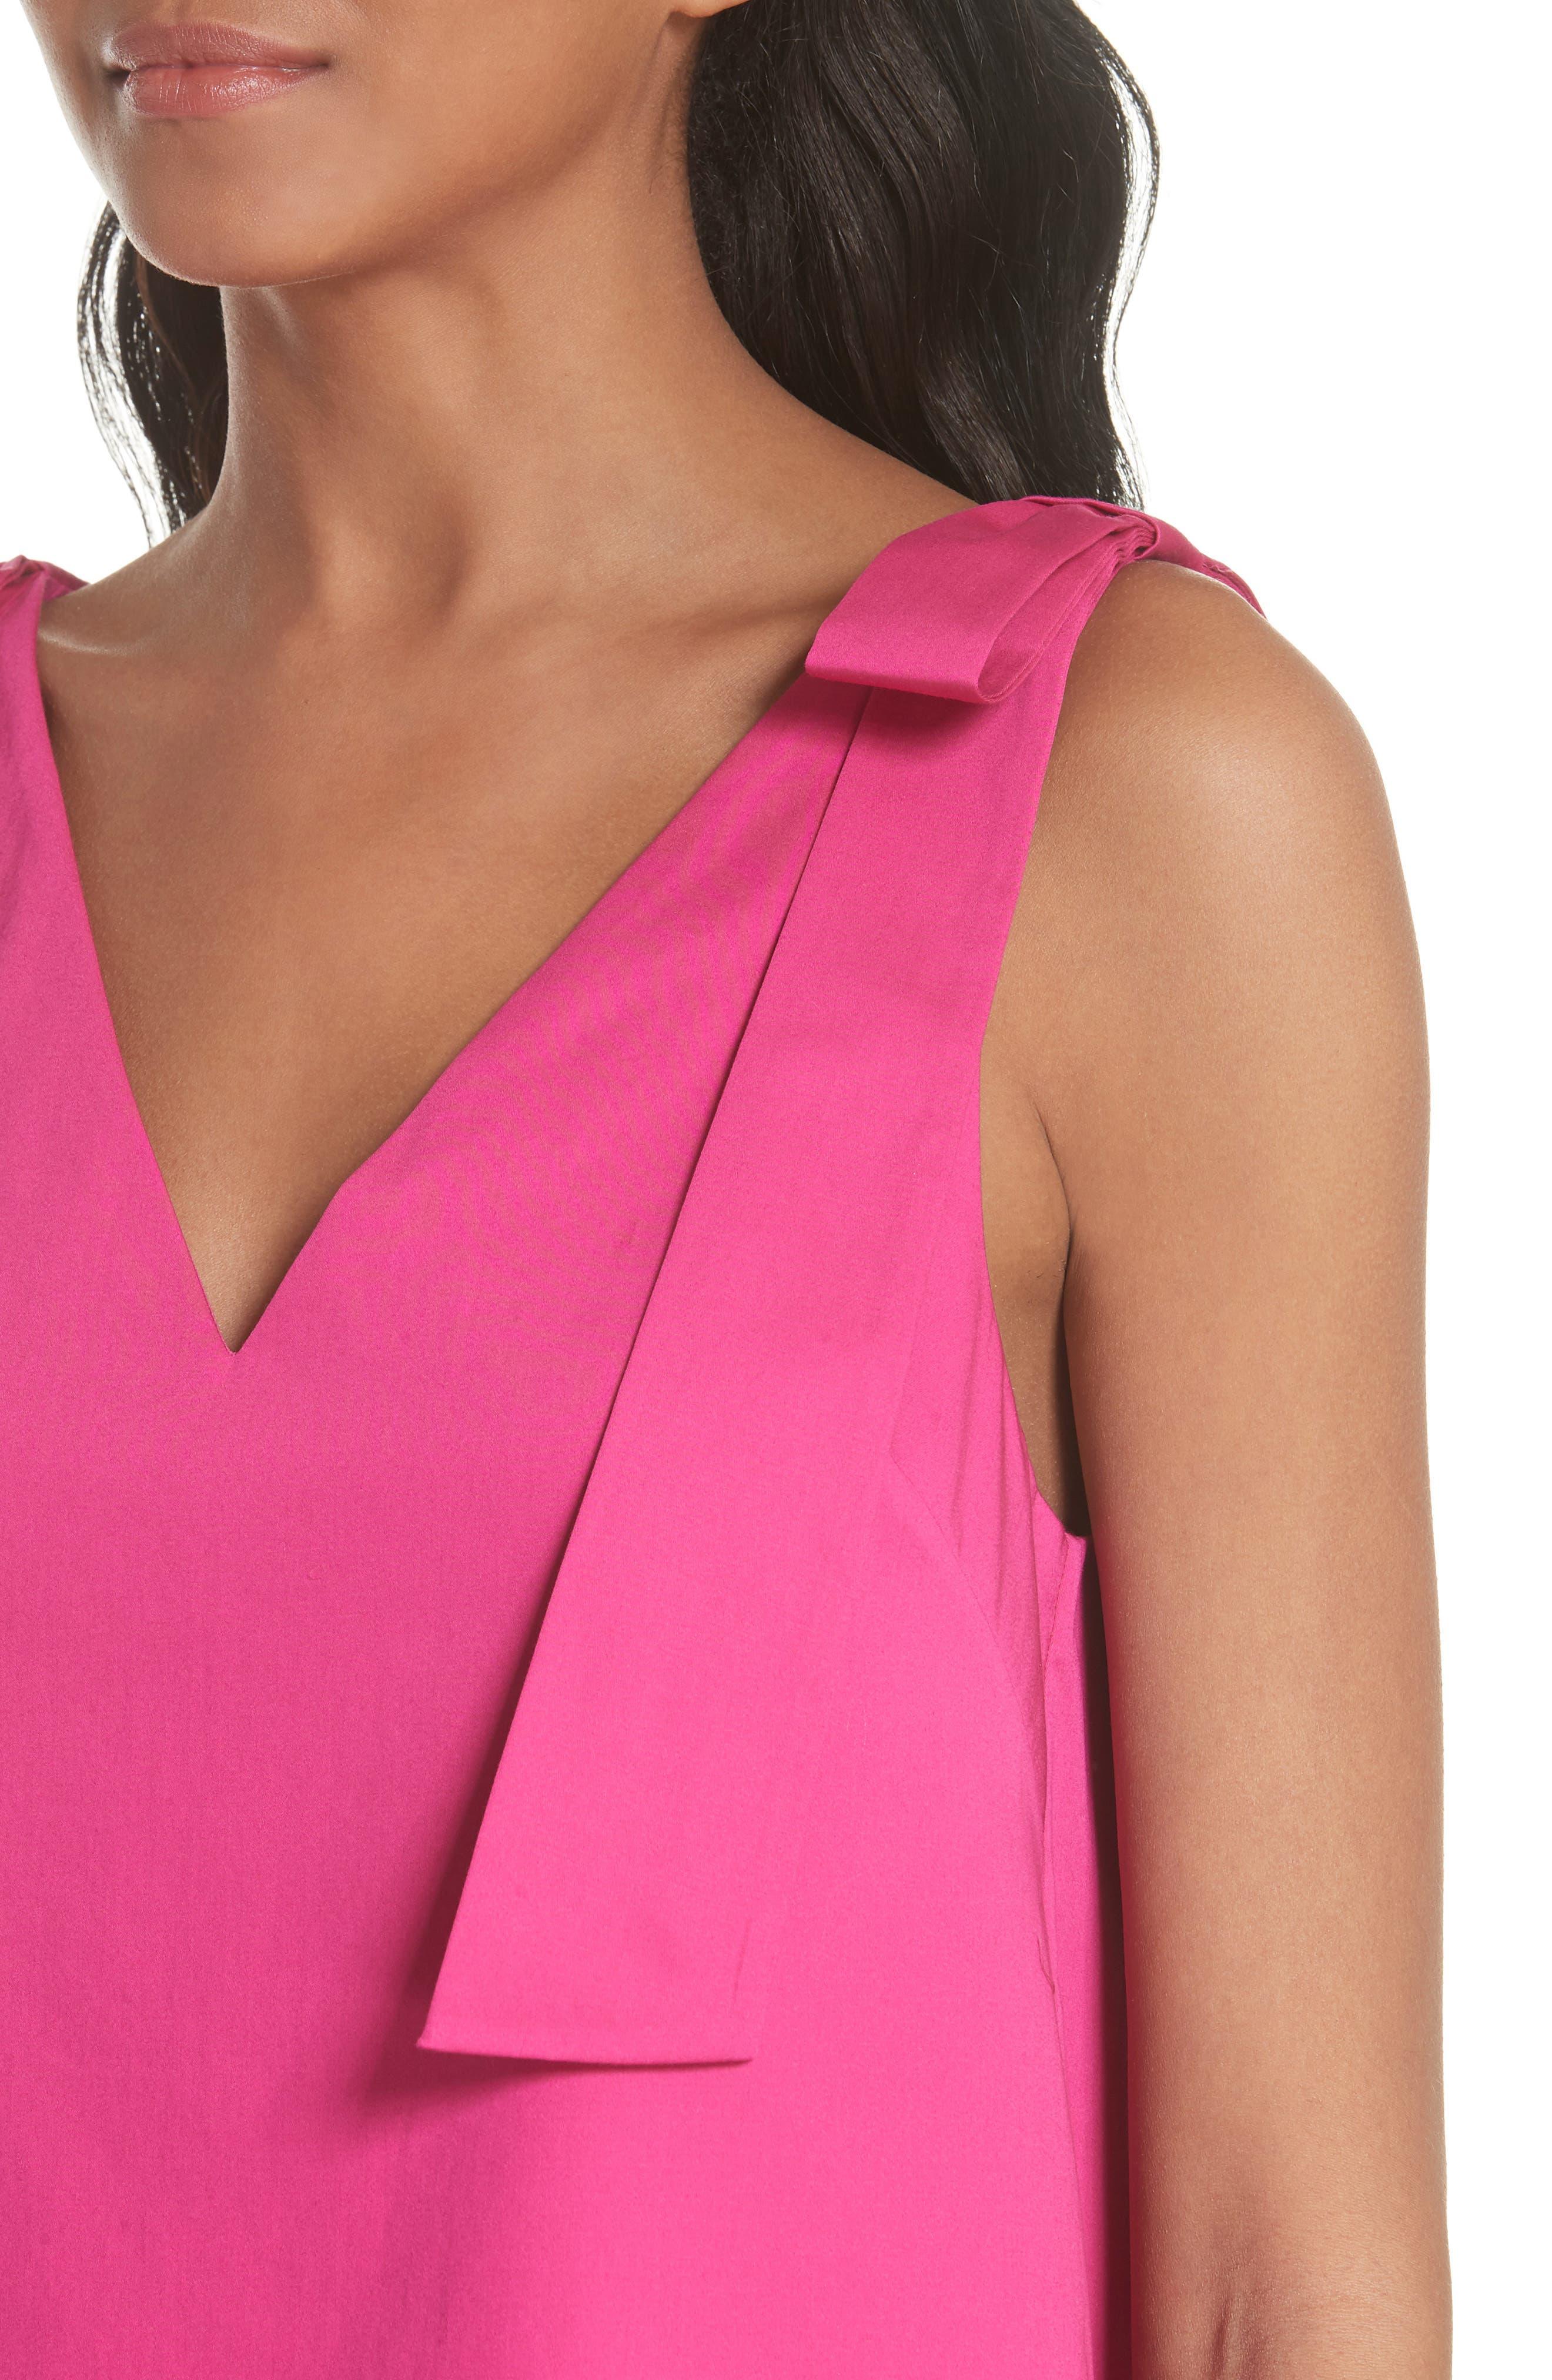 Daynaa Bow Shoulder Top,                             Alternate thumbnail 4, color,                             Fuchsia